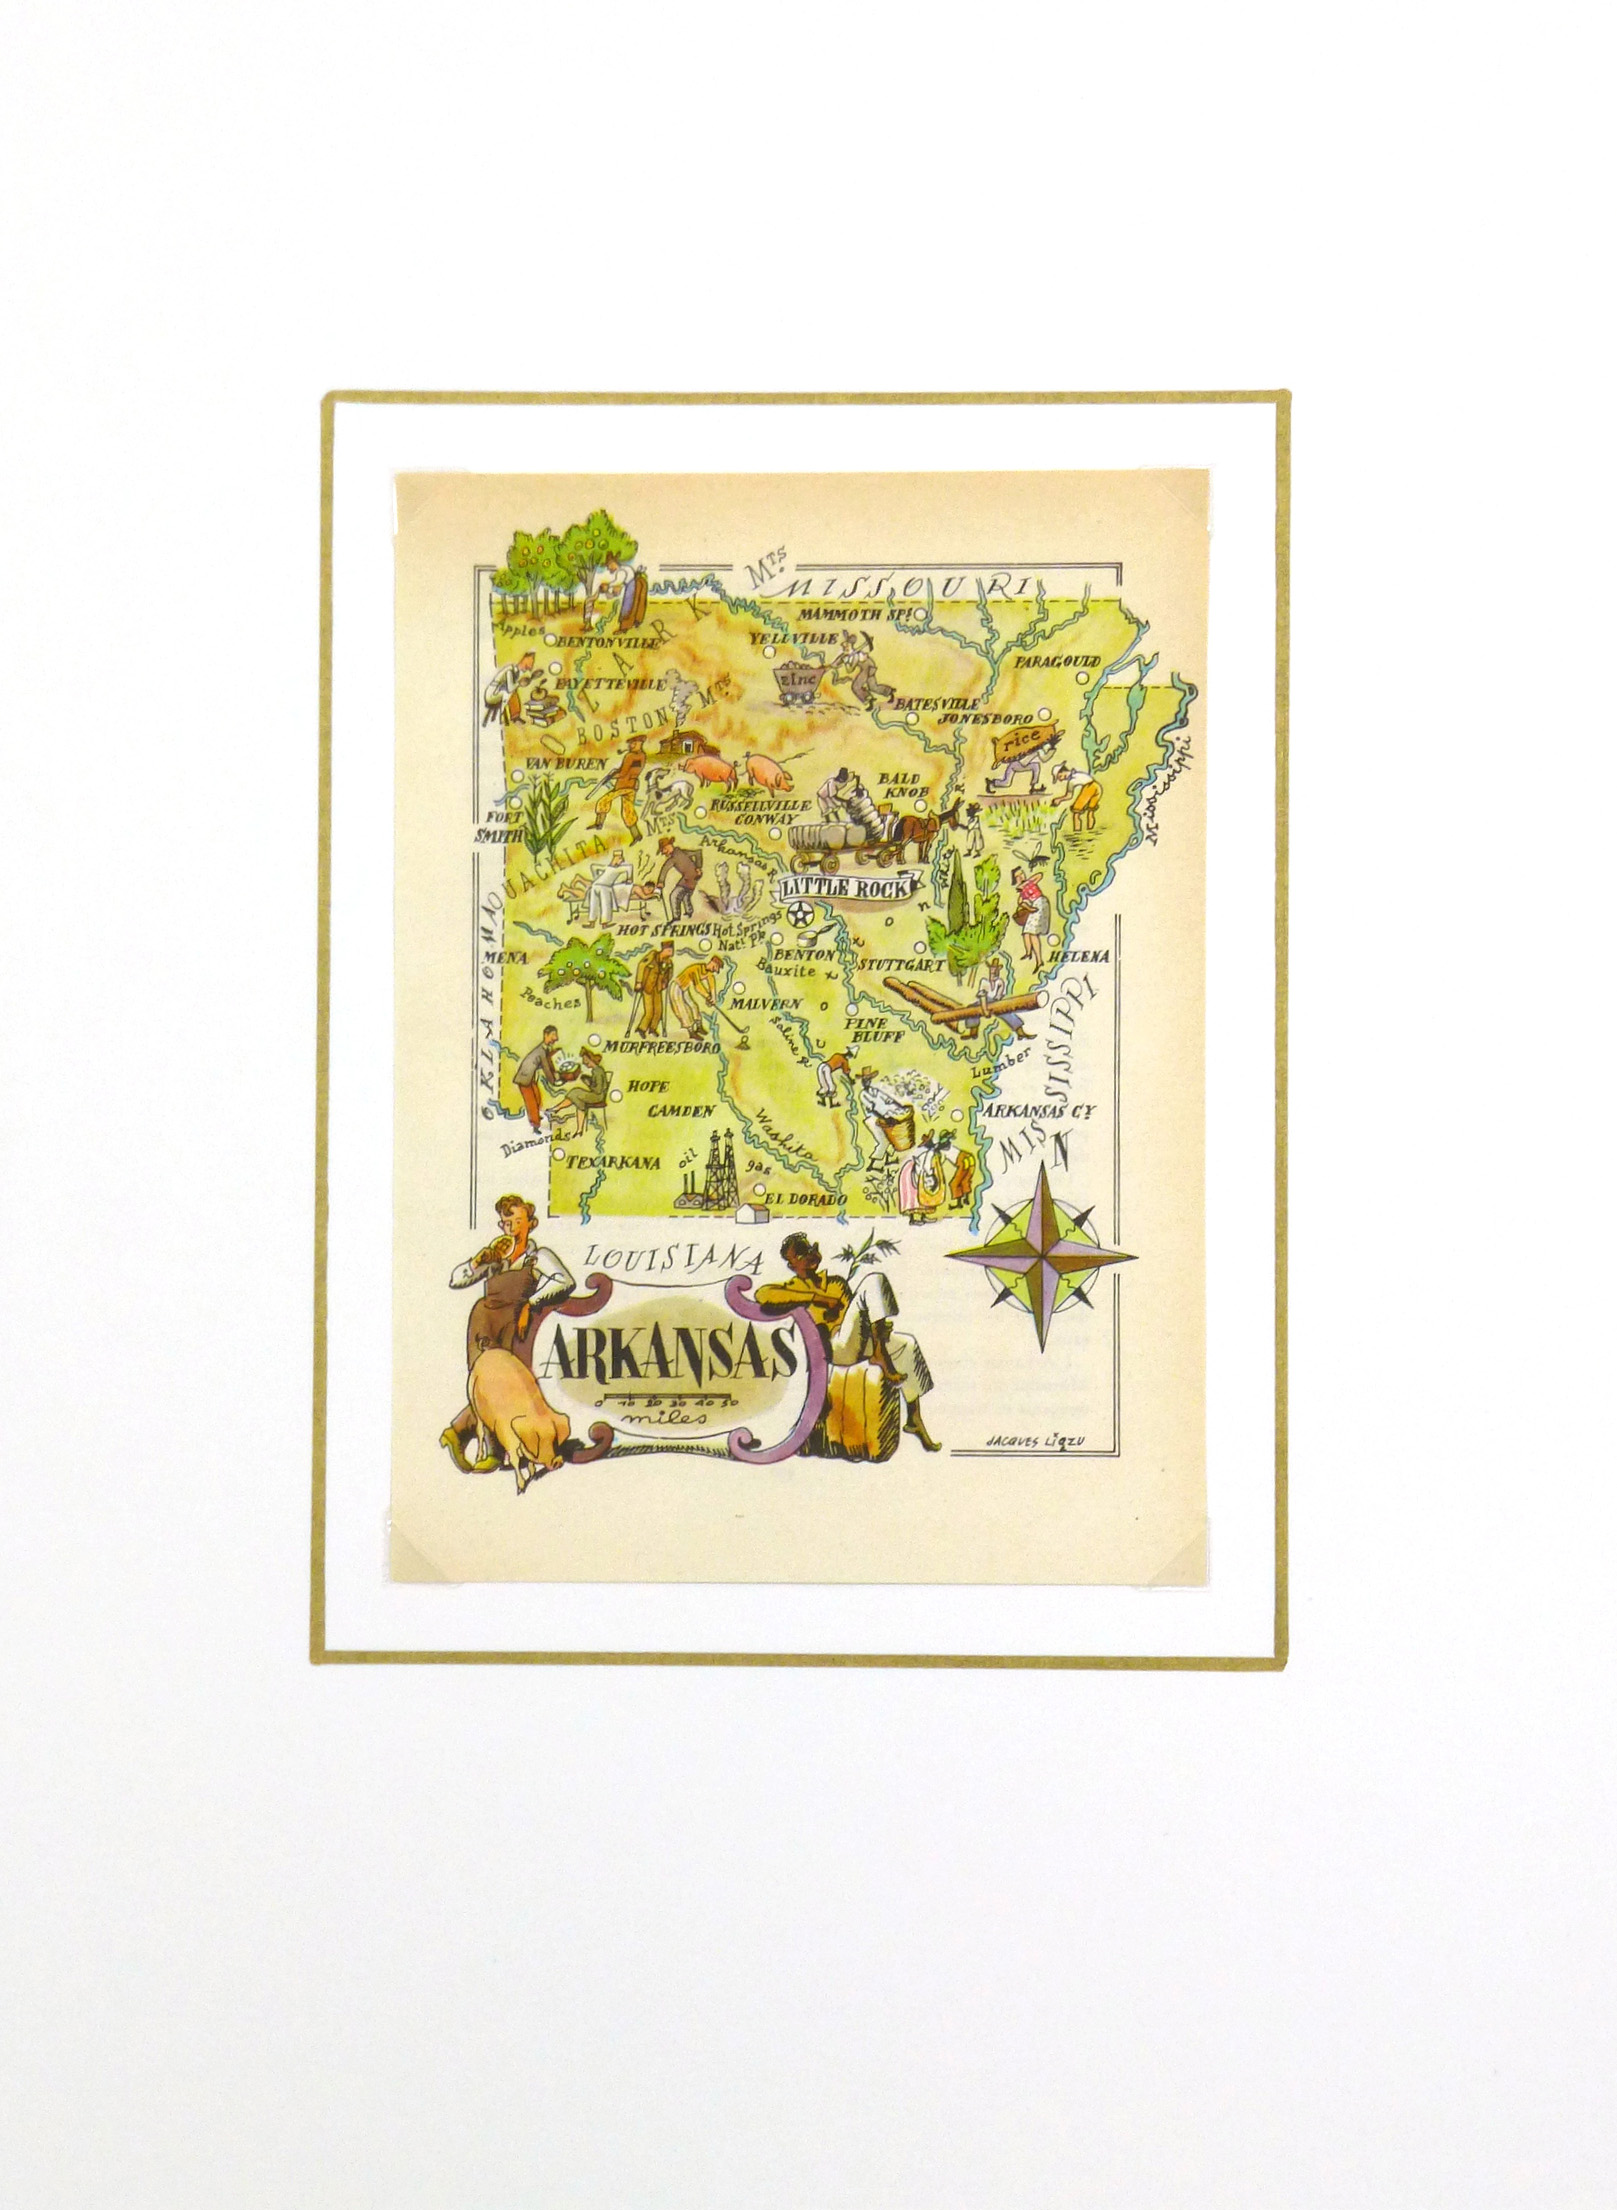 Pictorial Map - Arkansas, 1946-matted-6240K